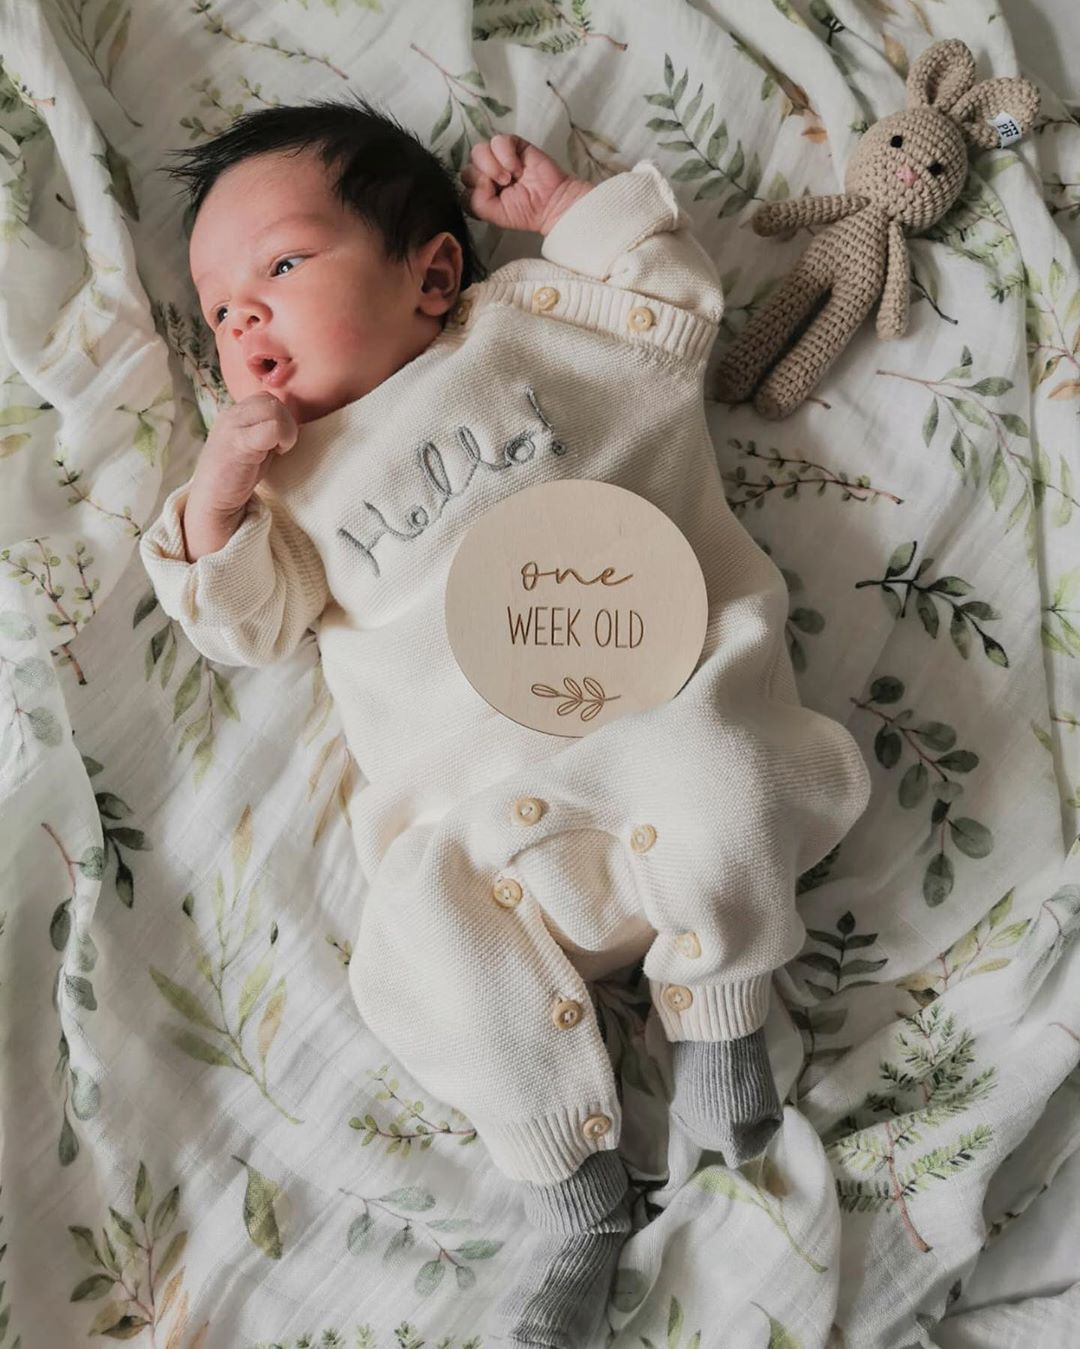 "♥ Petite Fashion | Vitri ♥ on Instagram: ""This little munchkin has filled our life over a week now 👼🏻🥰 ♥ ♥ ♥ ♥ ♥ ♥ ♥  #newborn #rainbowbaby #aprilbaby2020 #helloworld #newbornbaby…"""